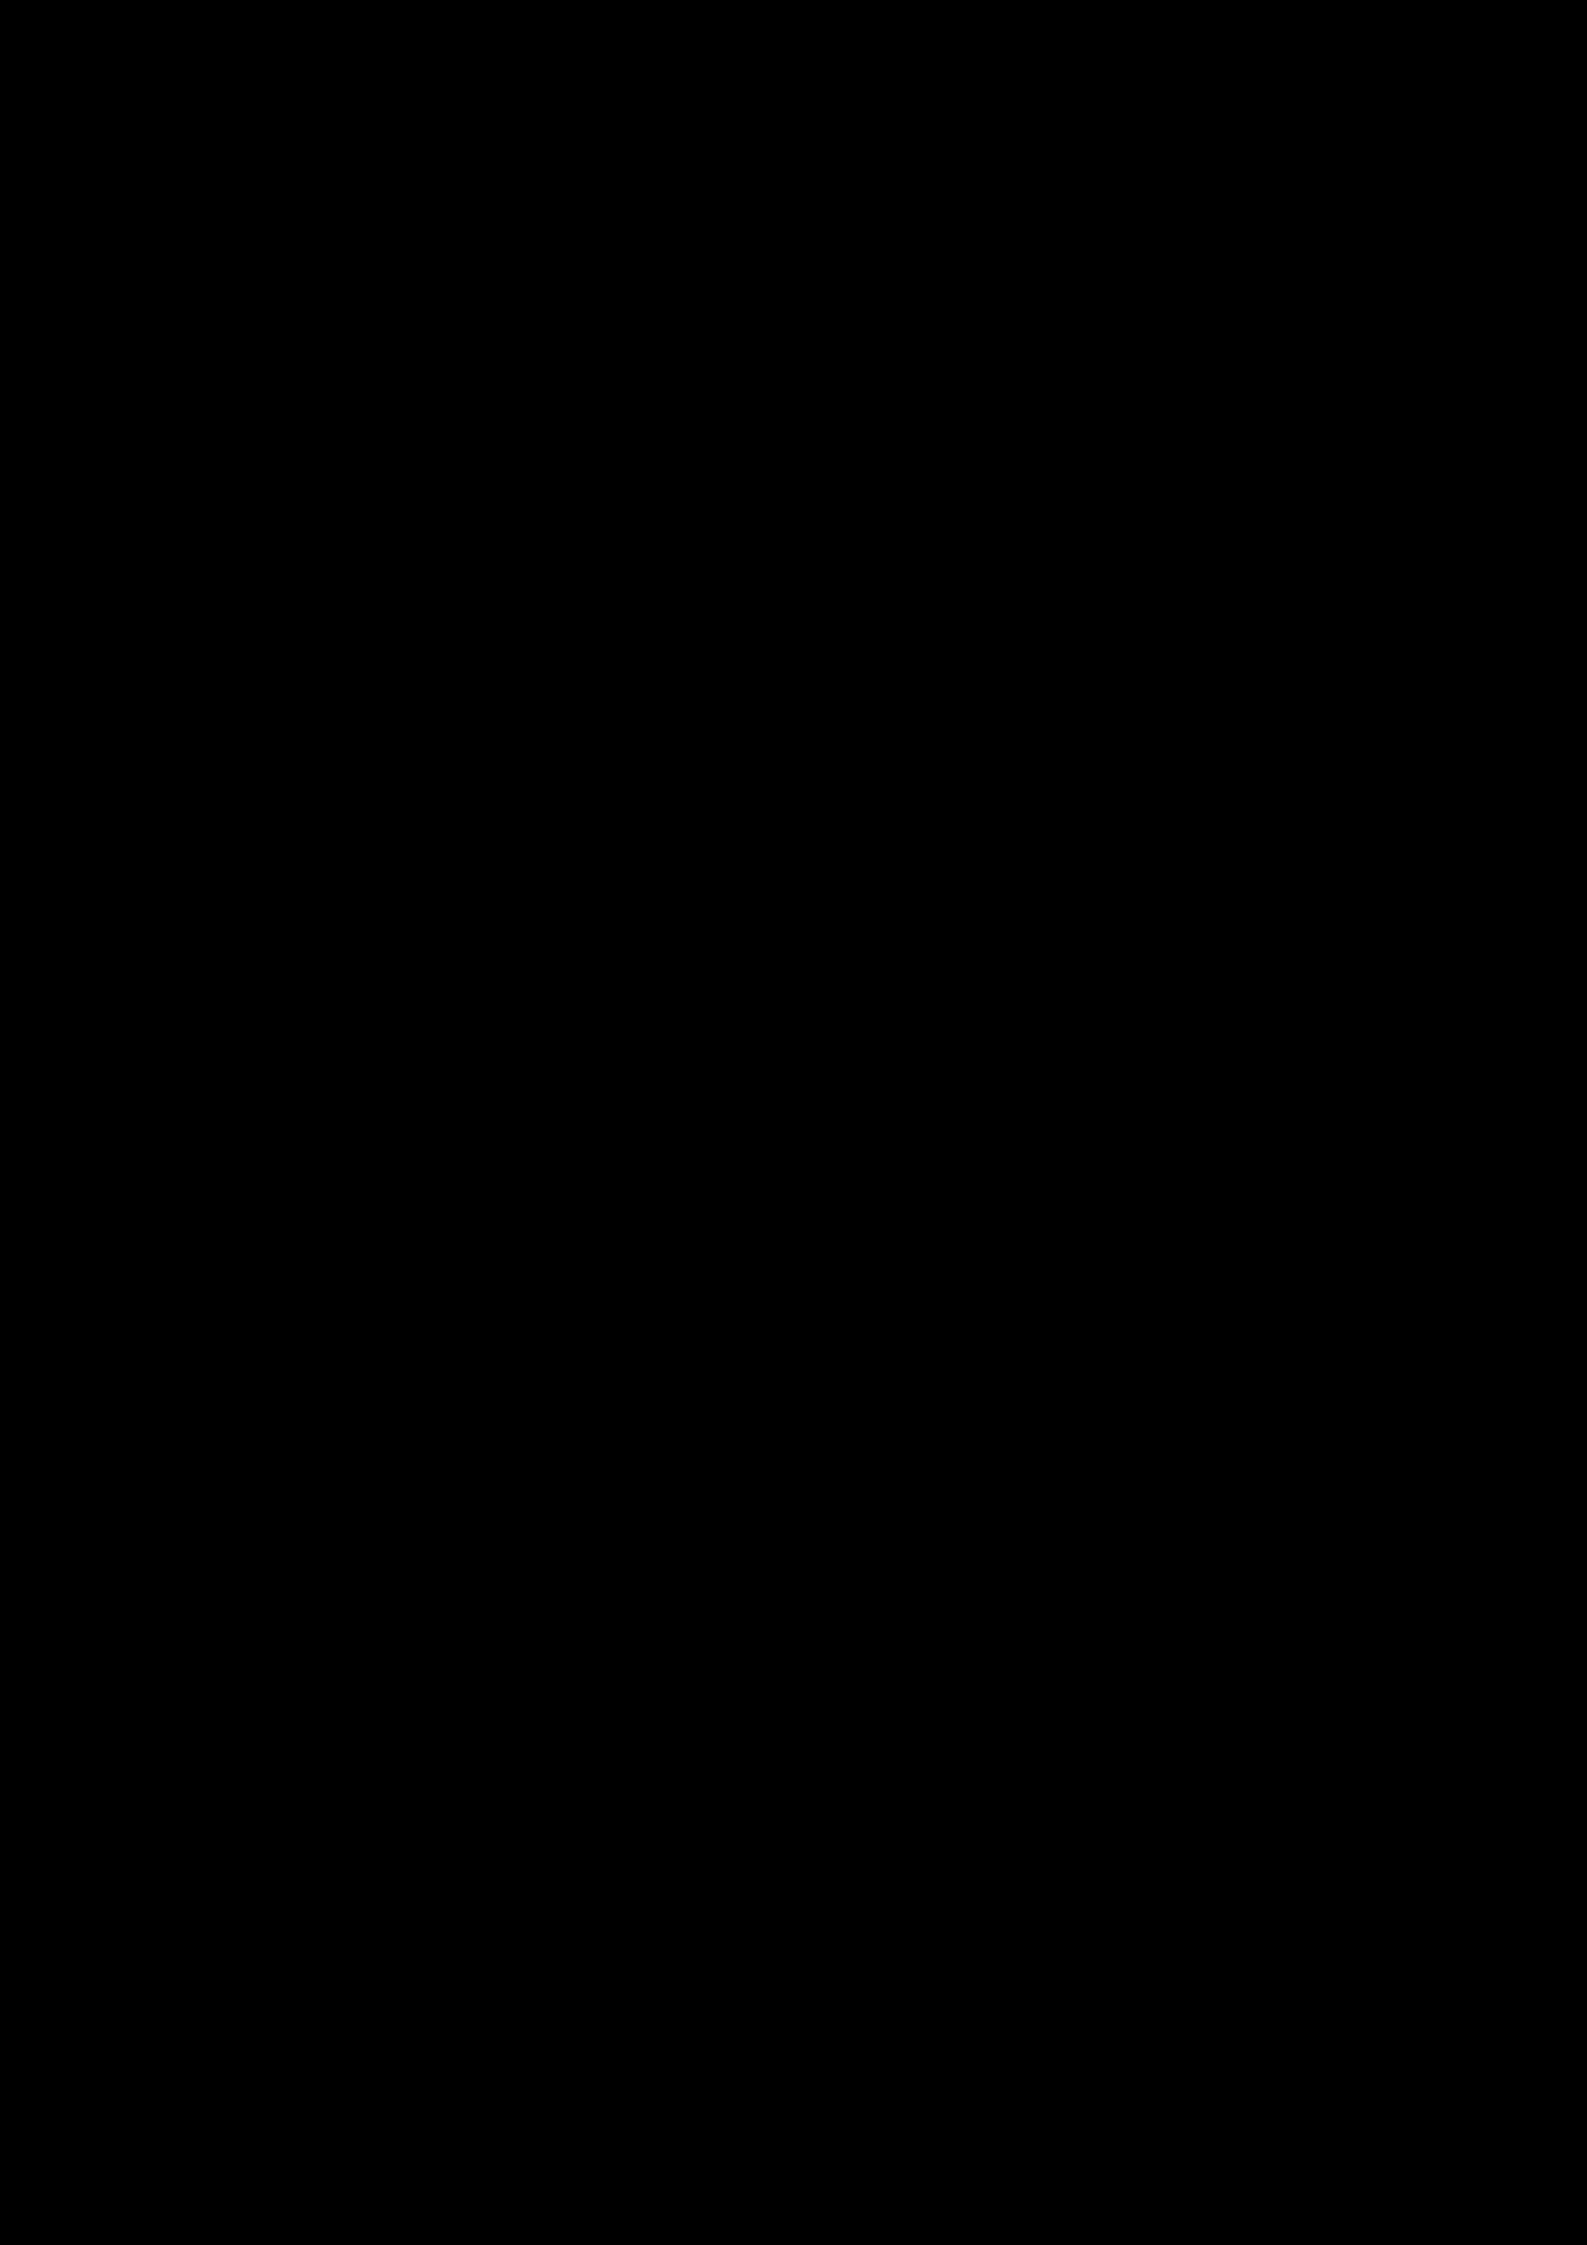 Sumarstarf Glaðheima